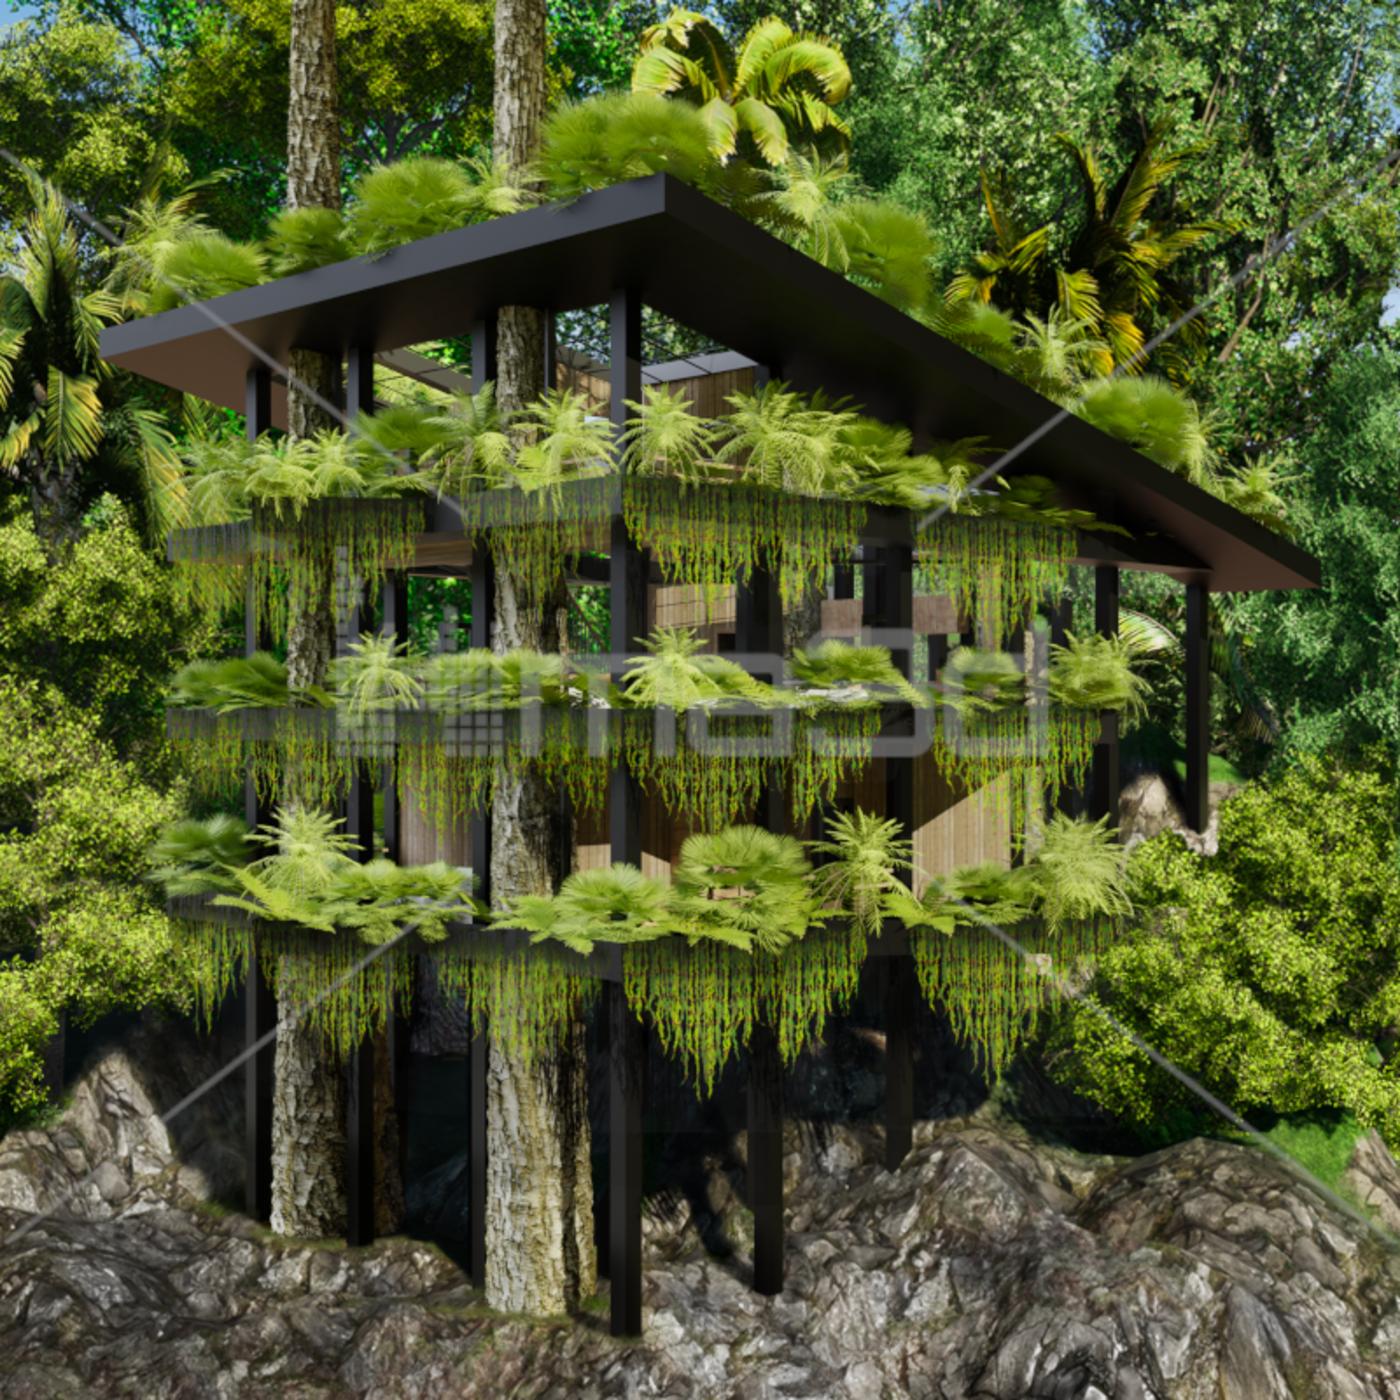 3D rendering of Tree house